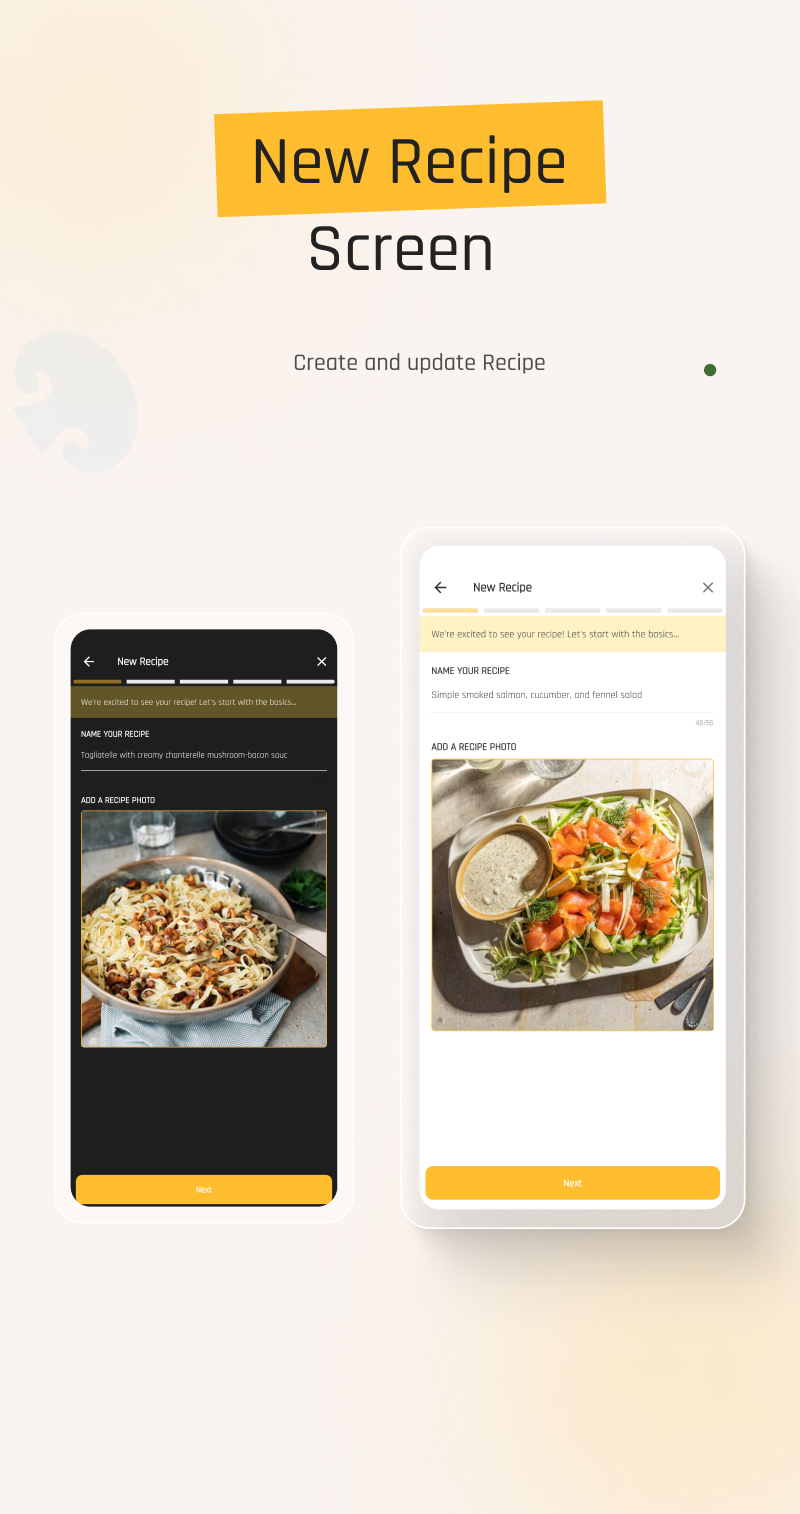 flutter recipe app | Ricetta | Iqonic Design flutter recipe app with laravel backend Ricetta 9